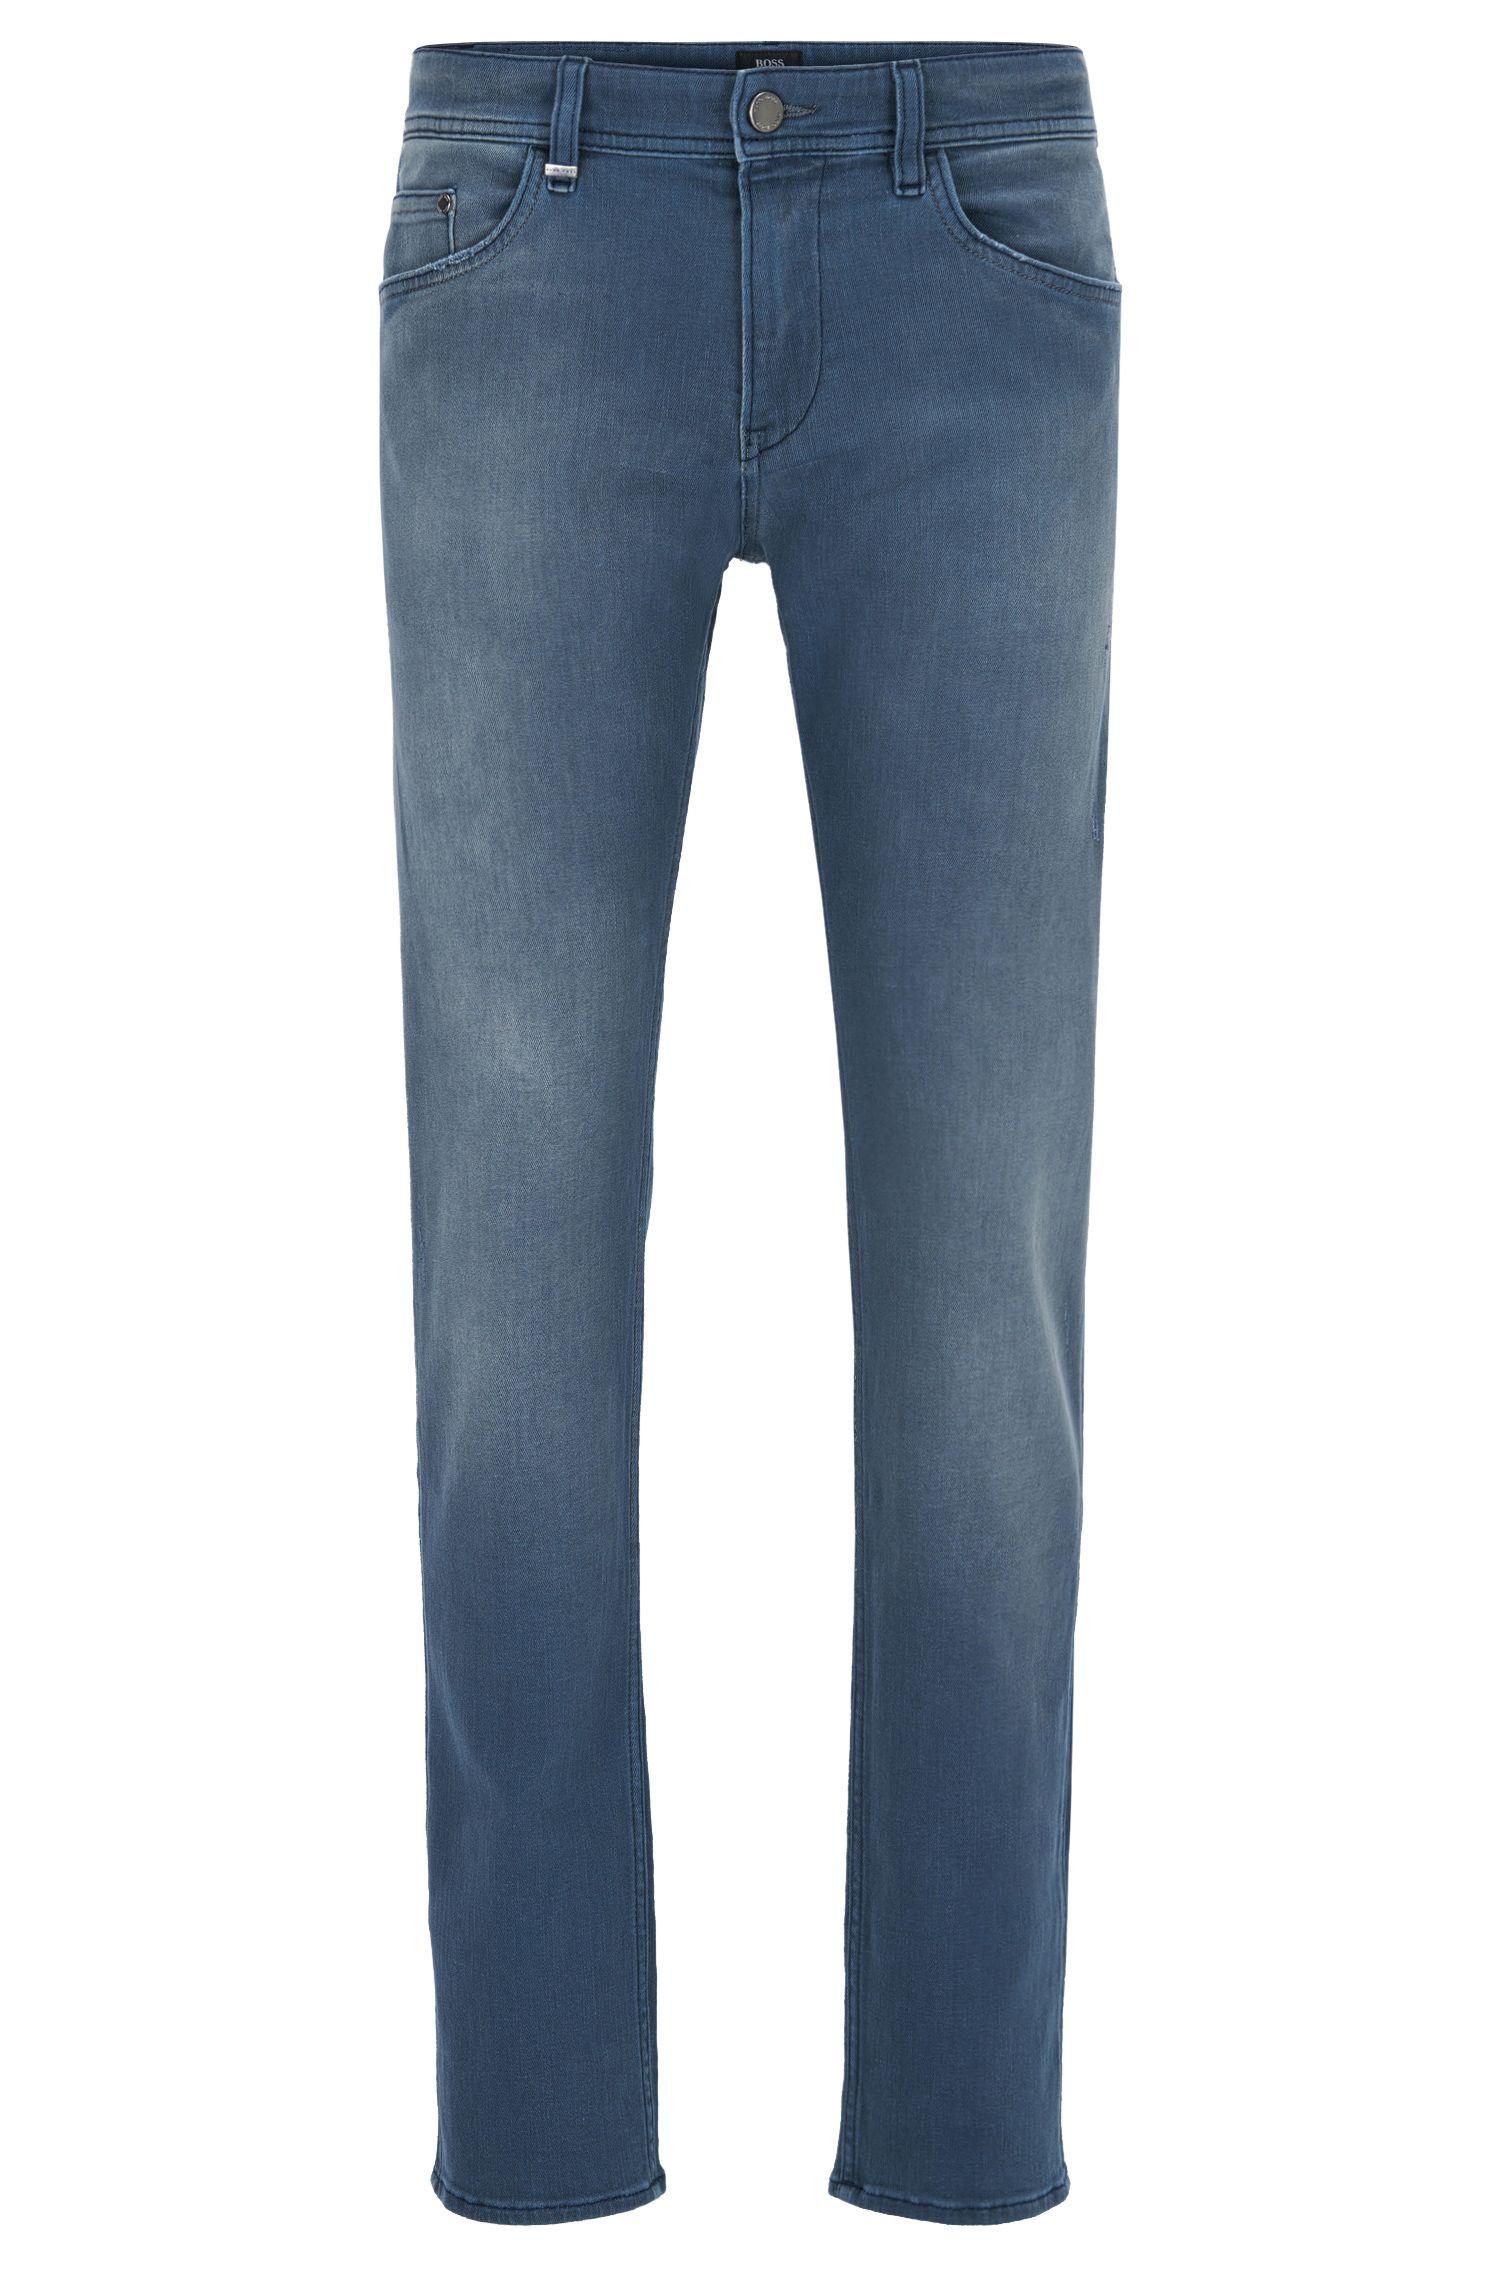 Stretch Cotton Jeans, Slim Fit | Delaware, Blue